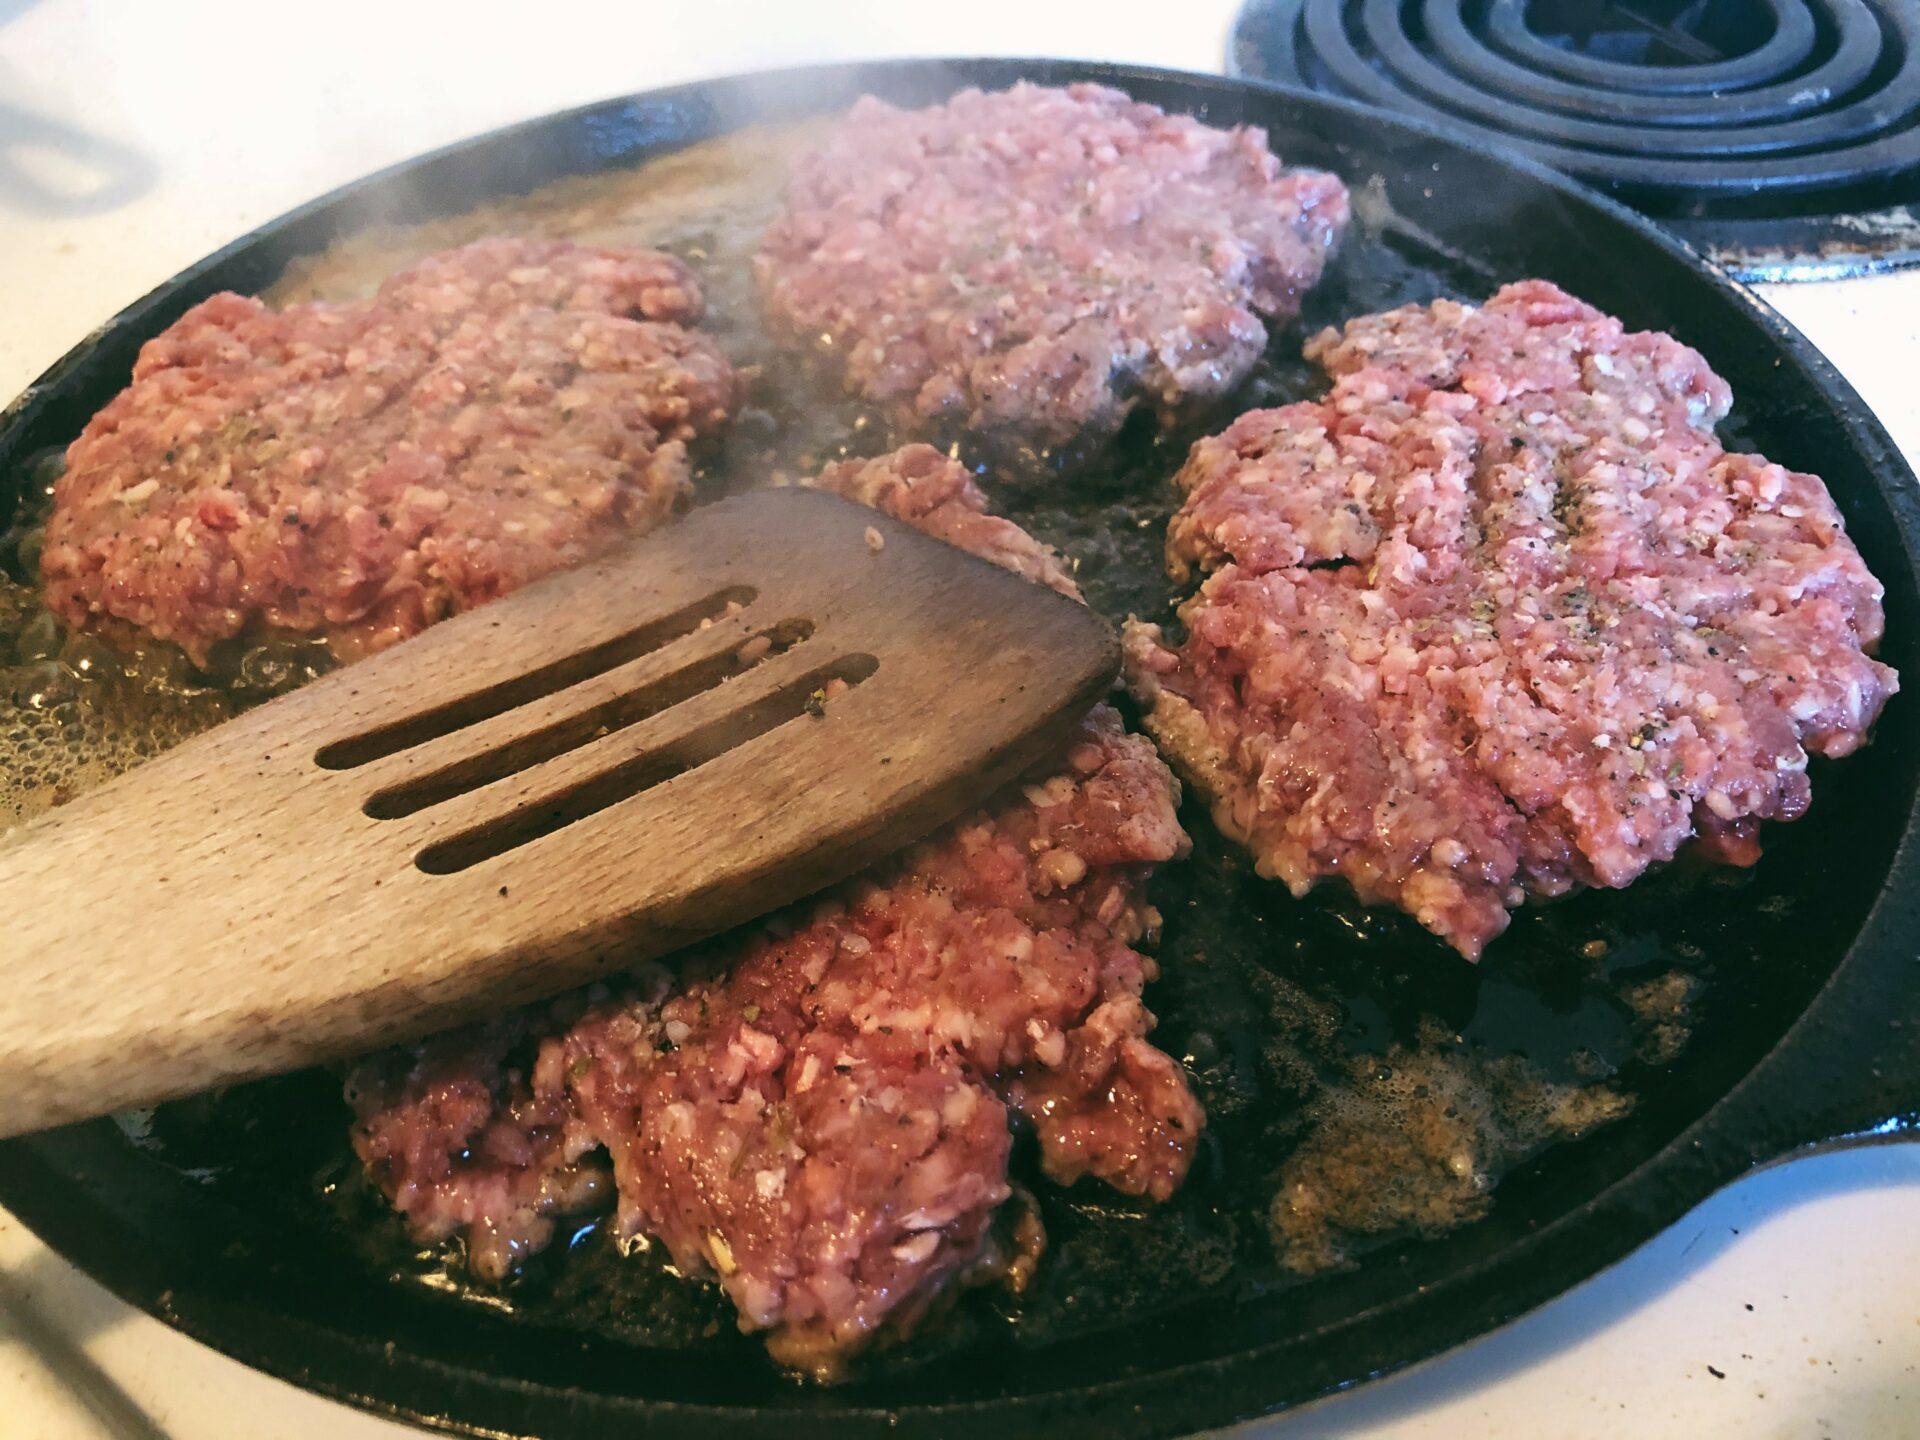 Venison Smash Burgers. Credit: Raeanne O'Meara.